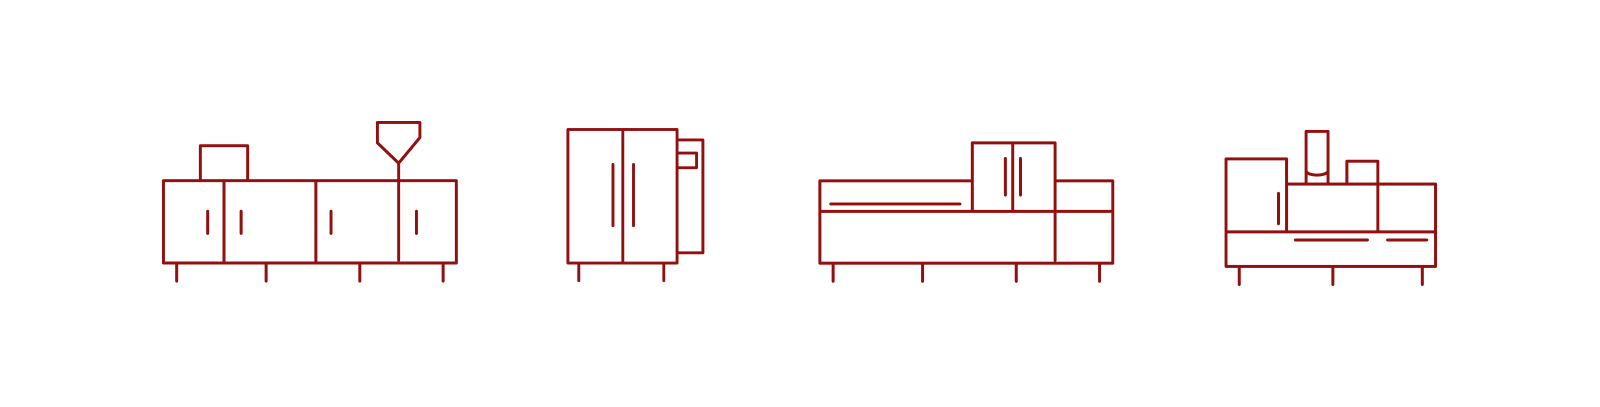 diseño comunicación Bossar iconos ingeniería barcelona